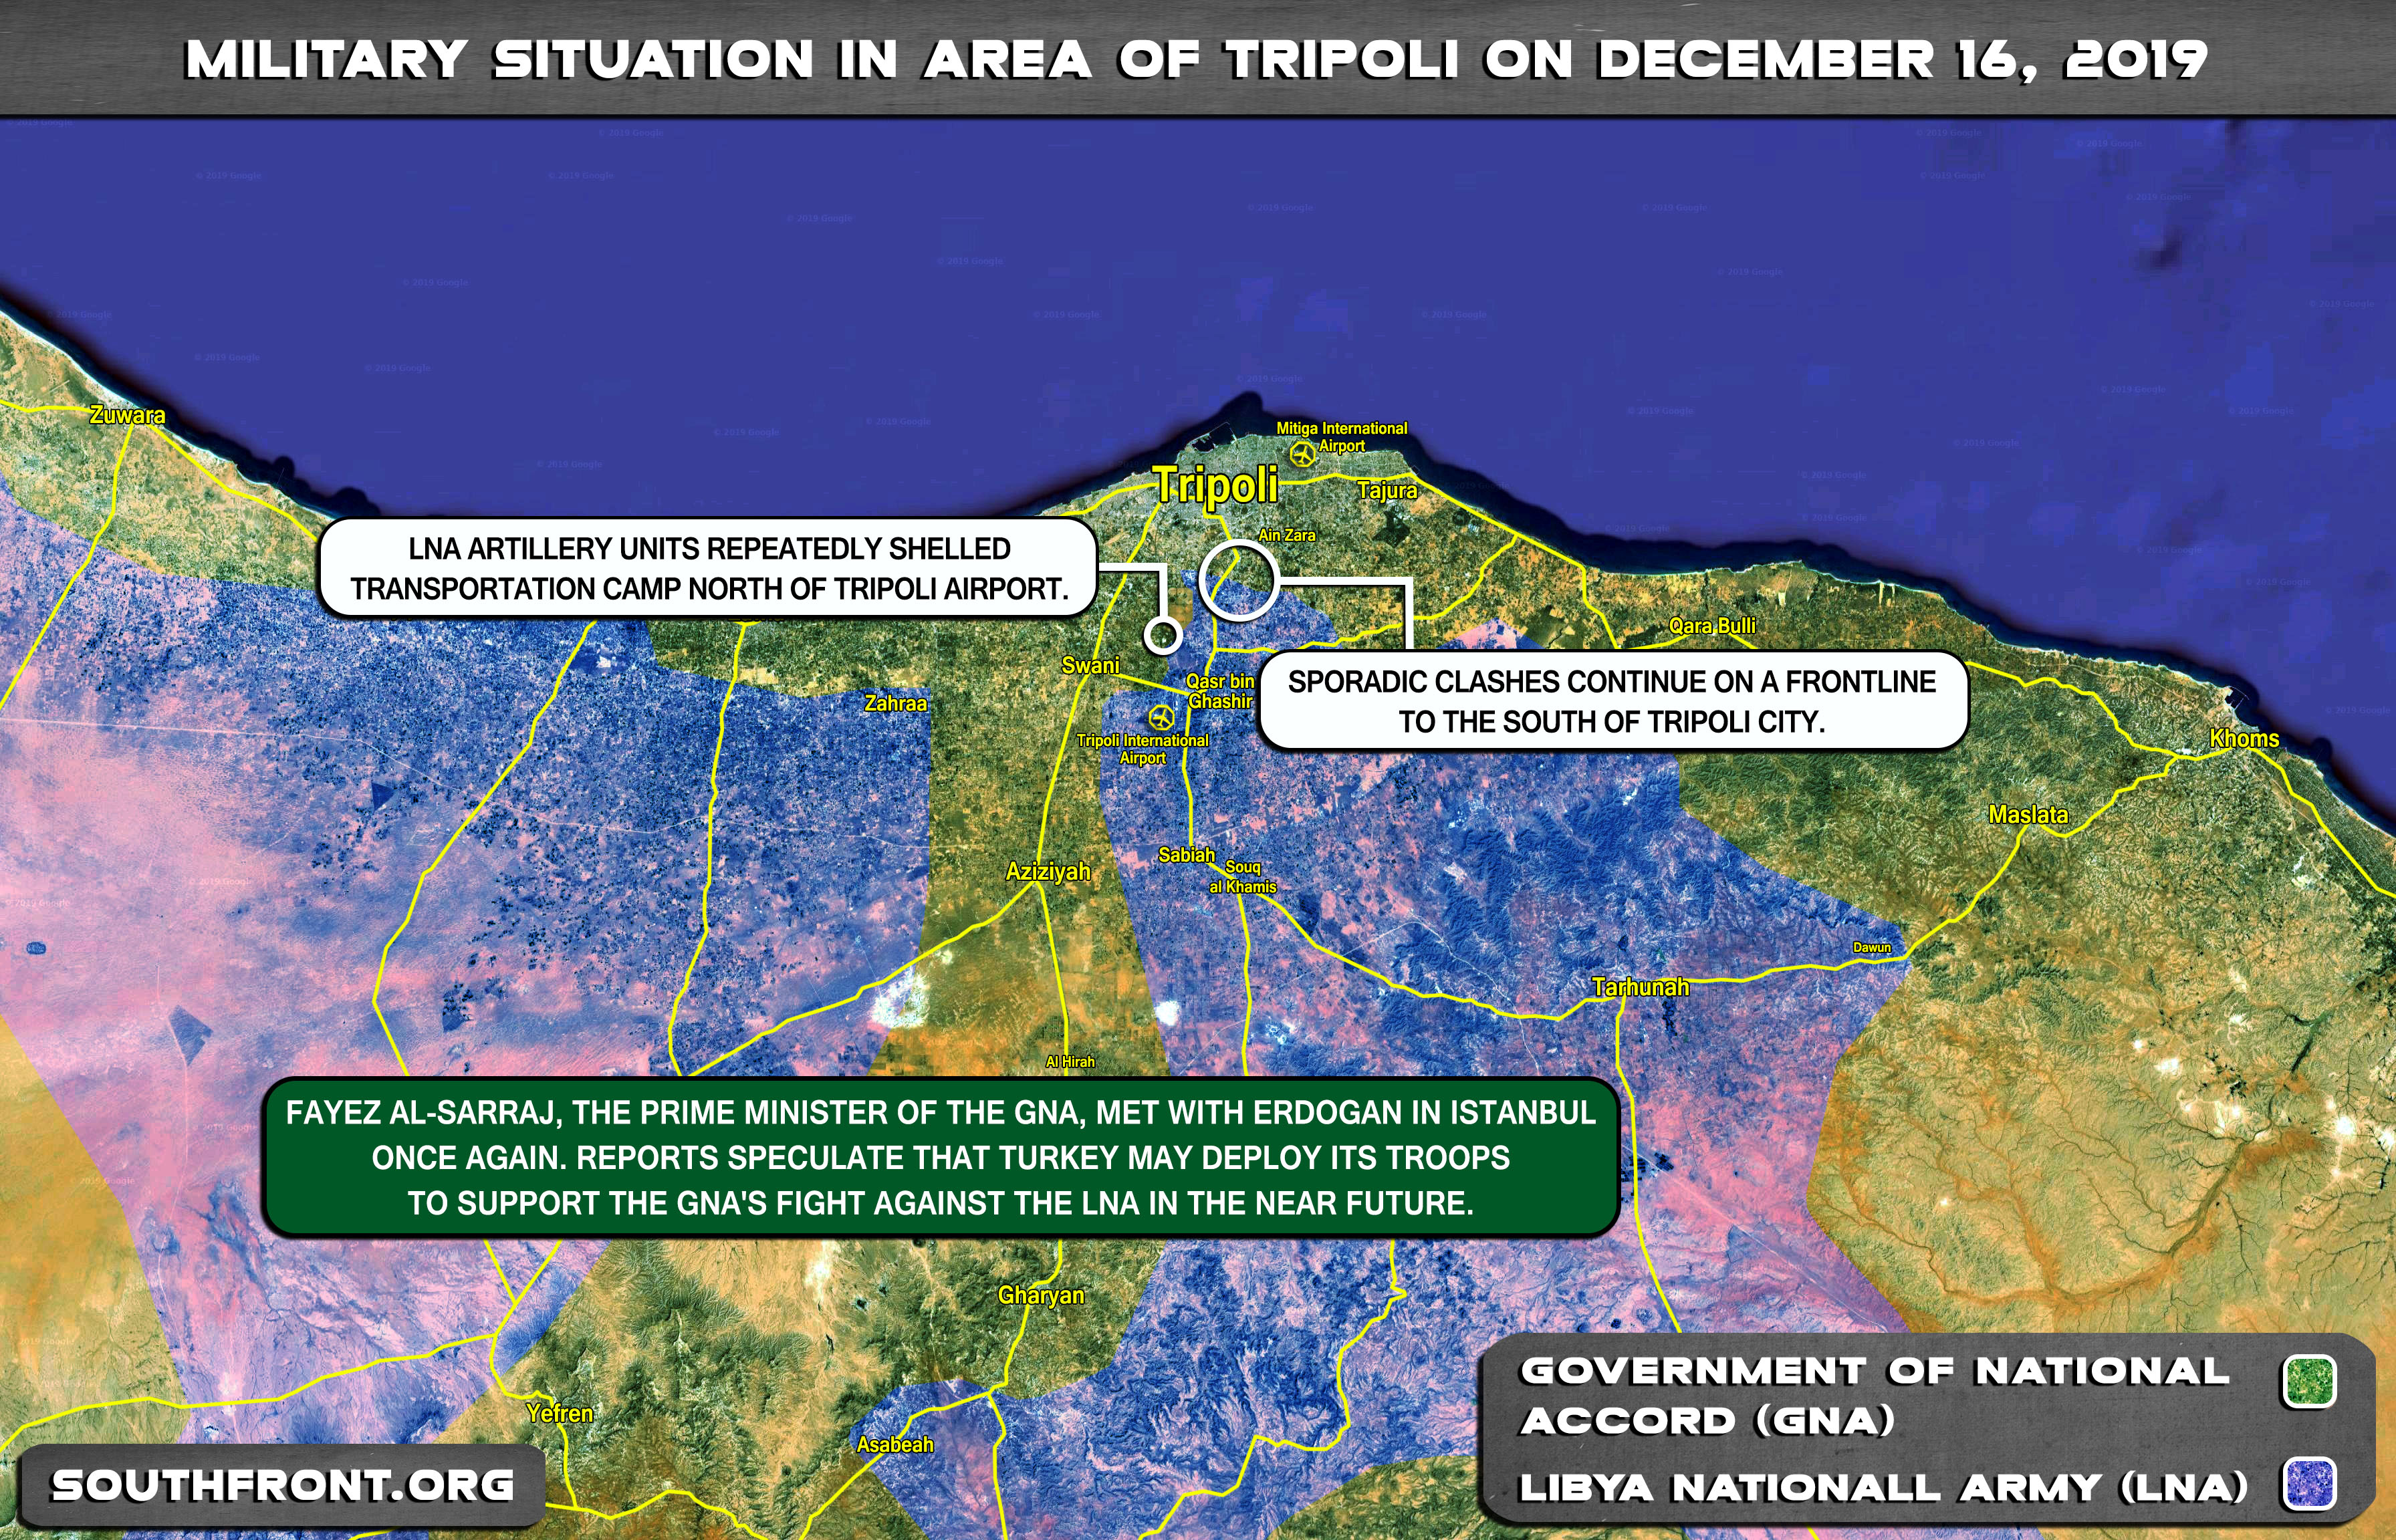 16dec_Tripoli-map.jpg